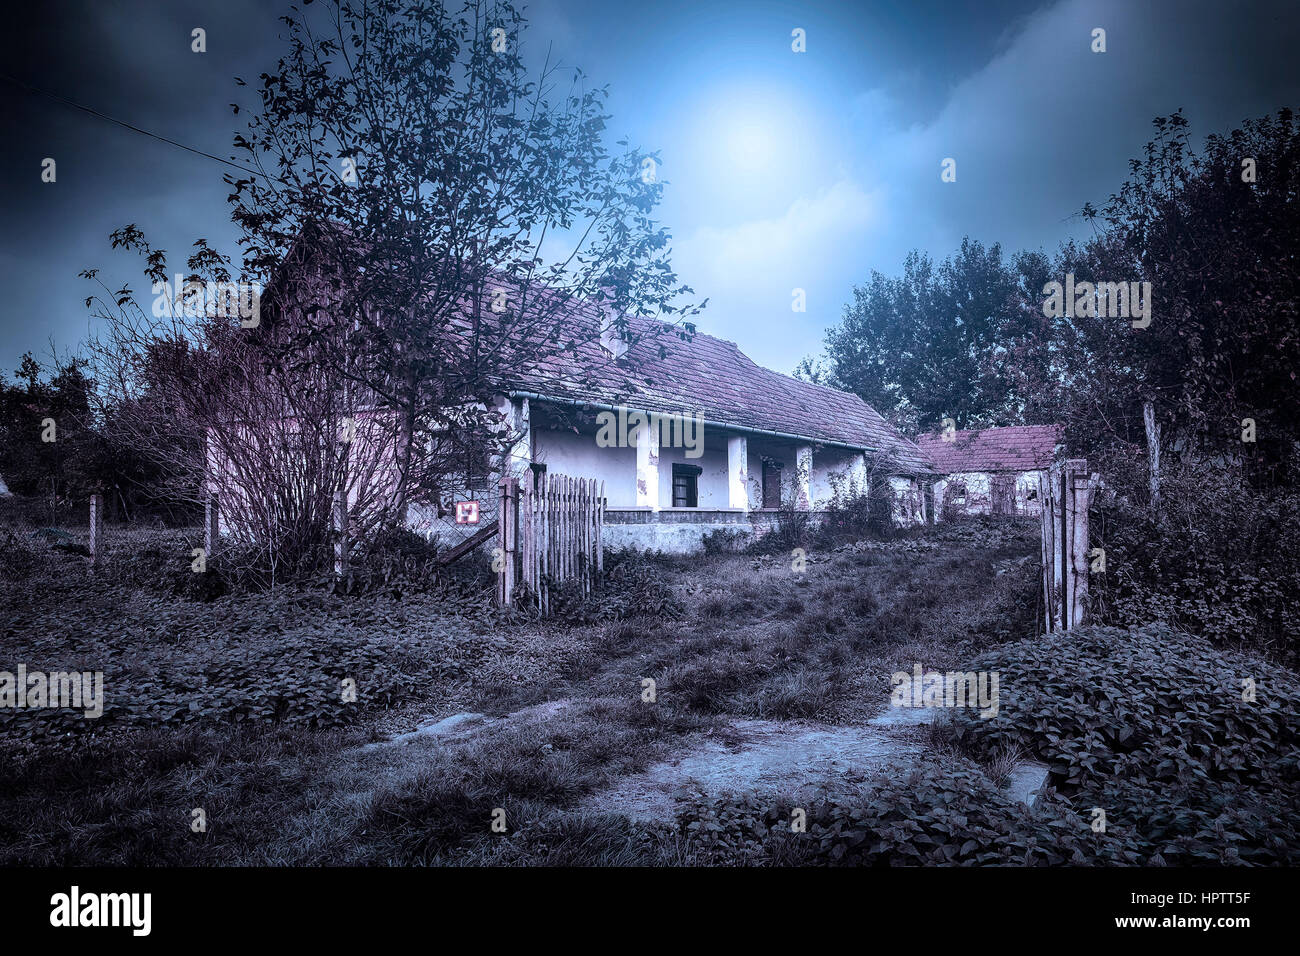 Gruselige verlassene Geisterhaus Stockbild